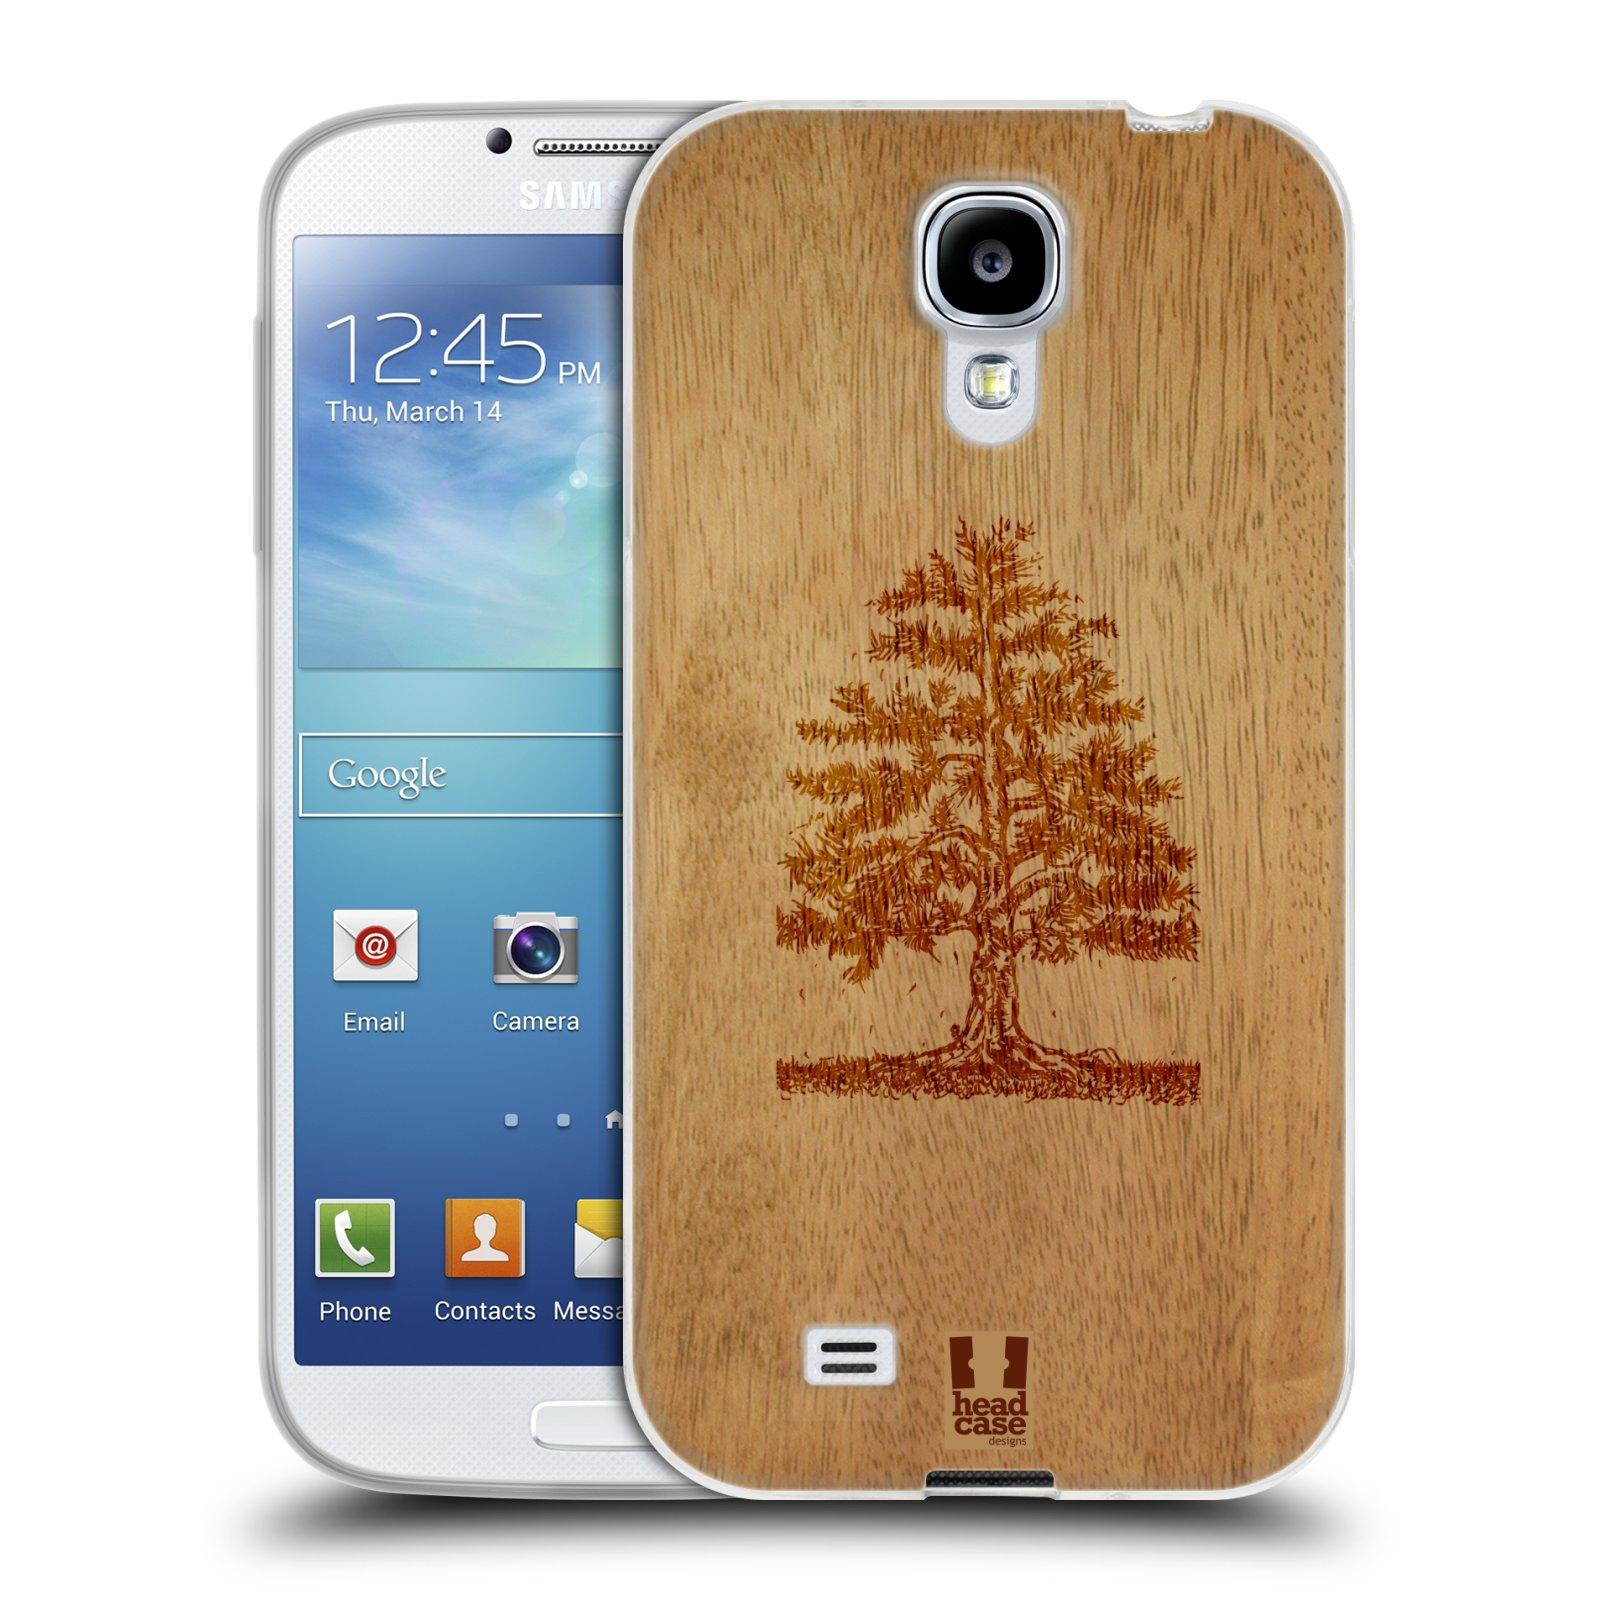 HEAD CASE silikonový obal na mobil Samsung Galaxy S4 i9500 vzor Dřevěné umění STROM